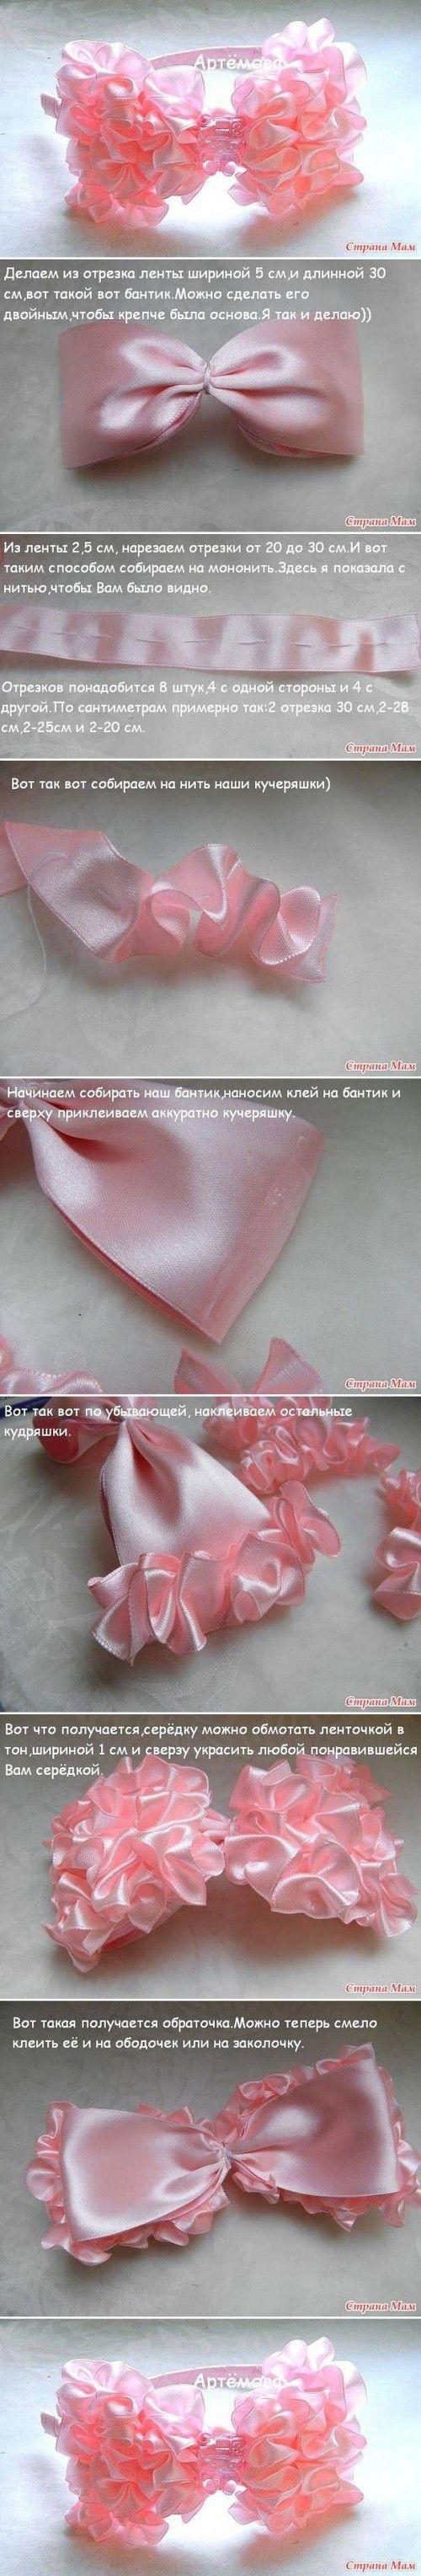 DIY Easy Ruffled Ribbon Hairband   www.FabArtDIY.com LIKE Us on Facebook ==> https://www.facebook.com/FabArtDIY